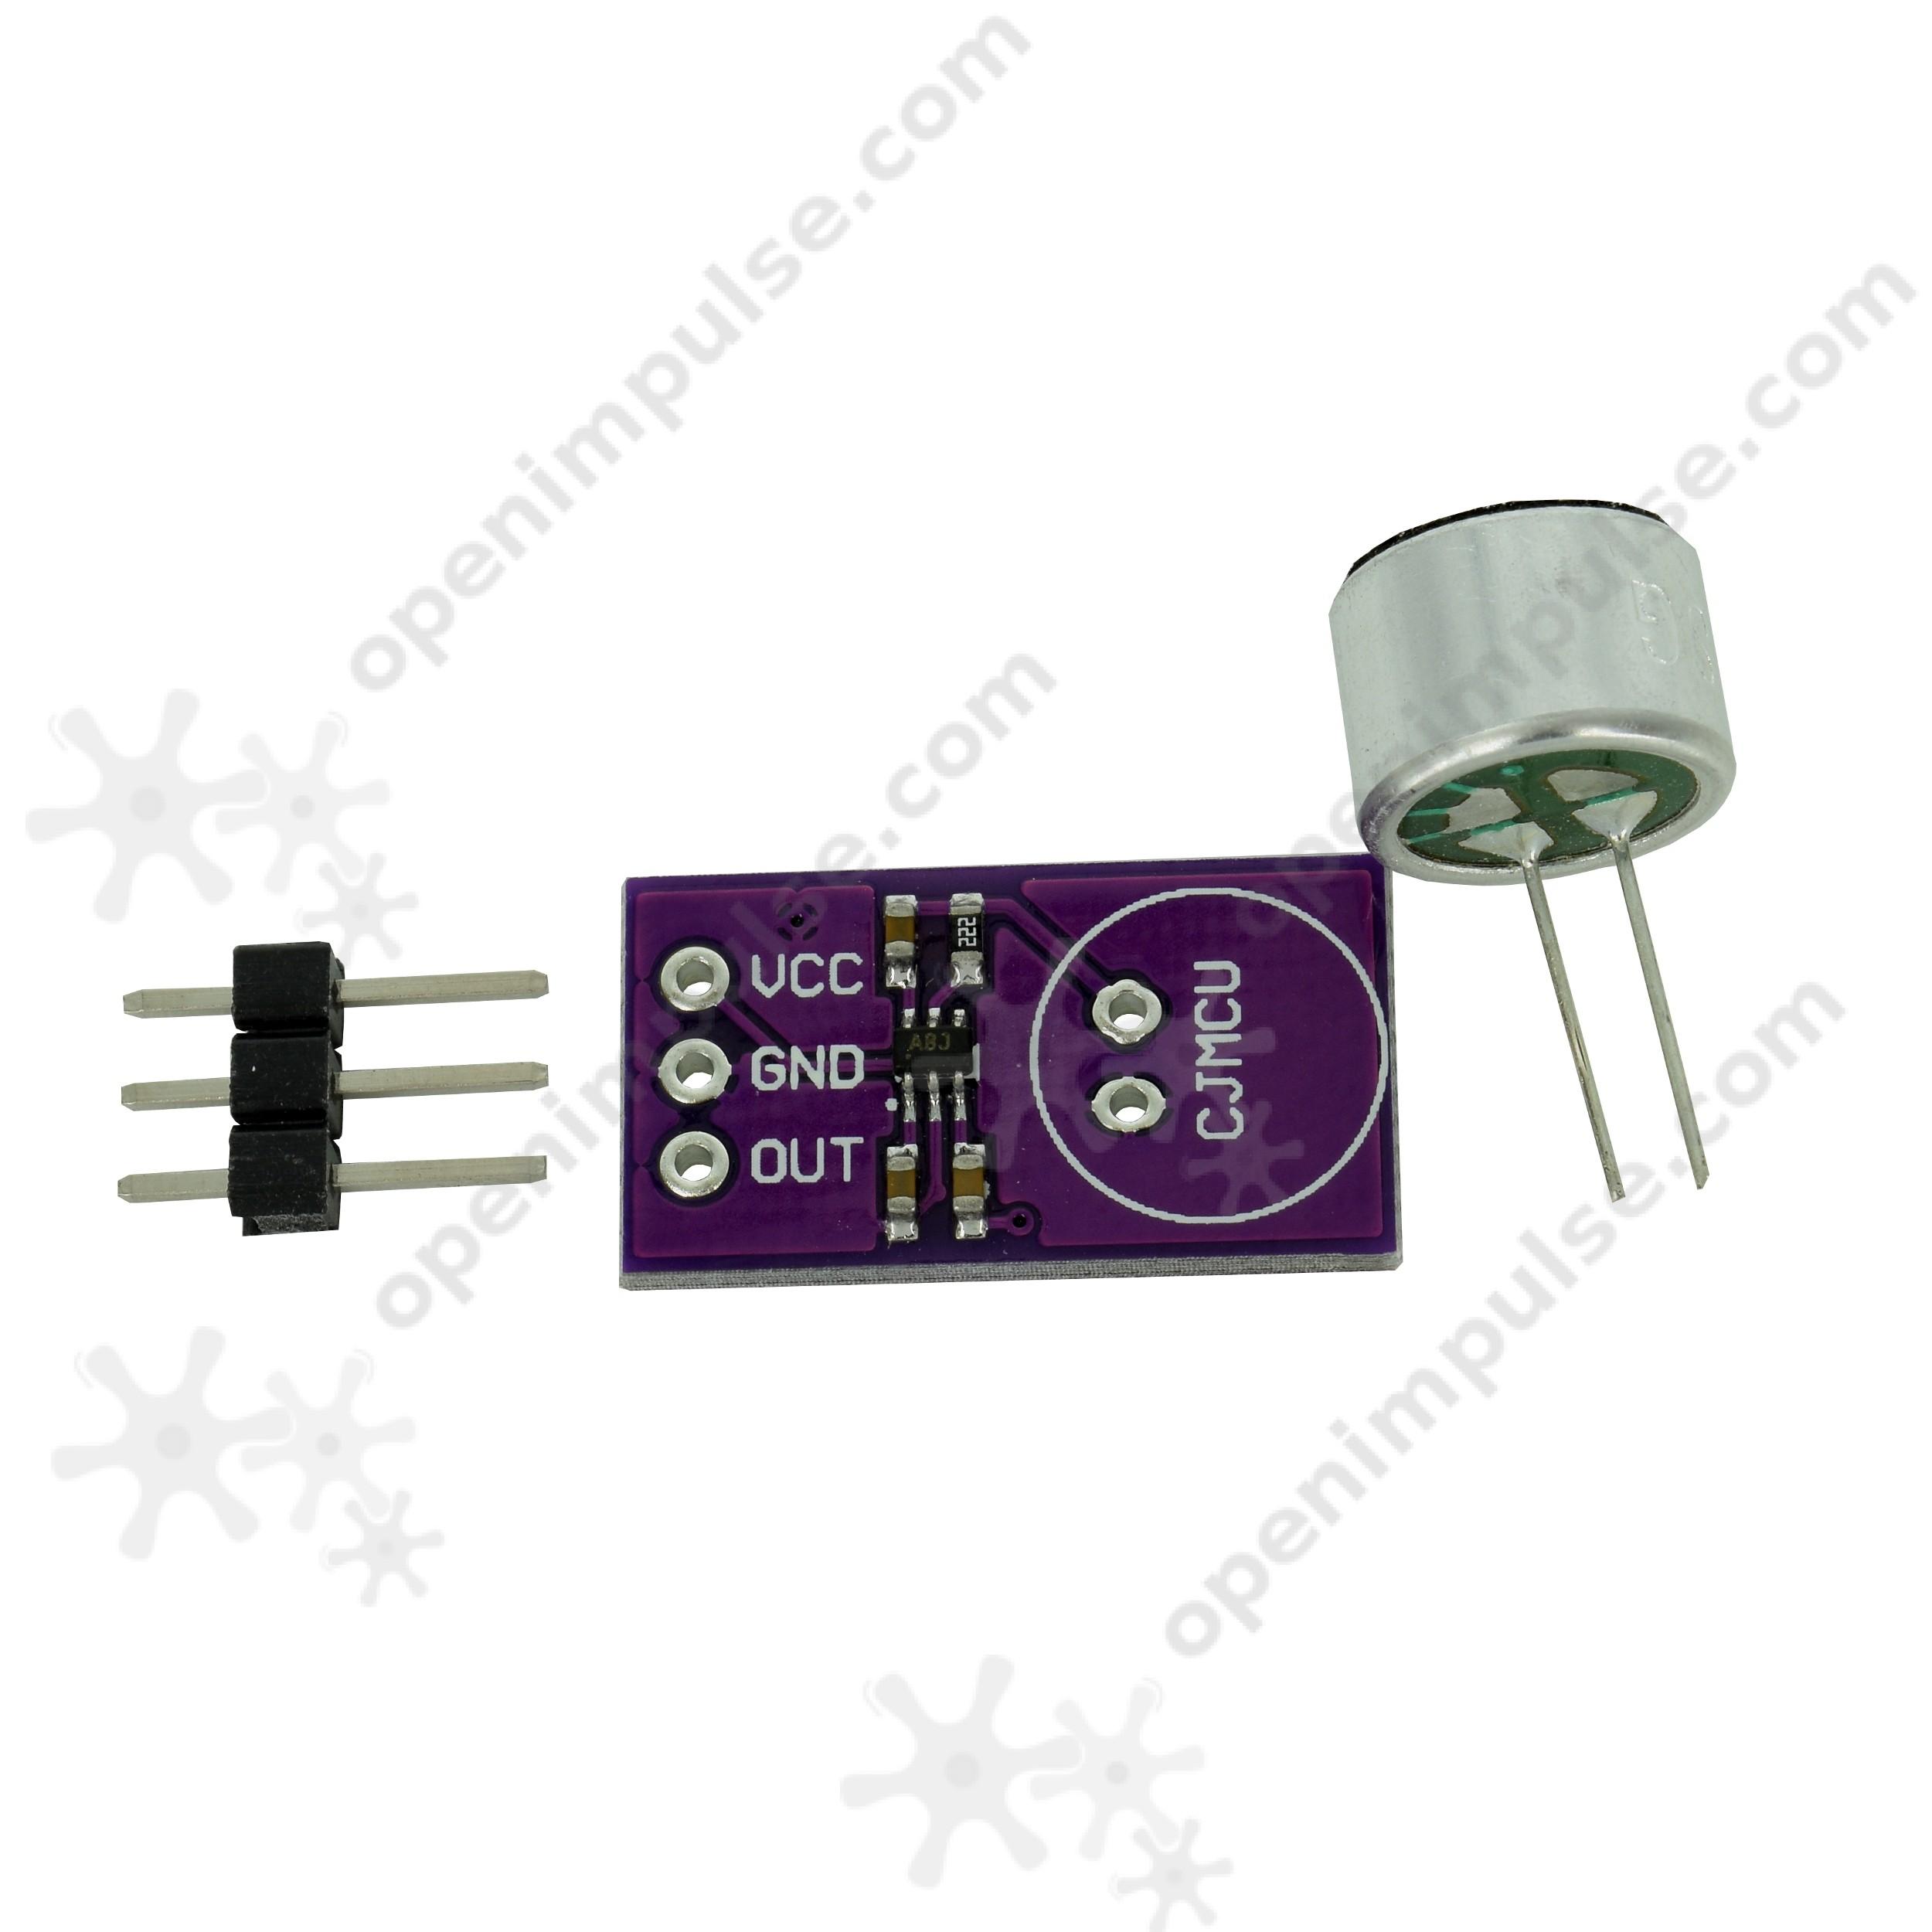 Max9812l Electret Microphone Amplifier Module Open Impulseopen Impulse Mic Preamp Circuit